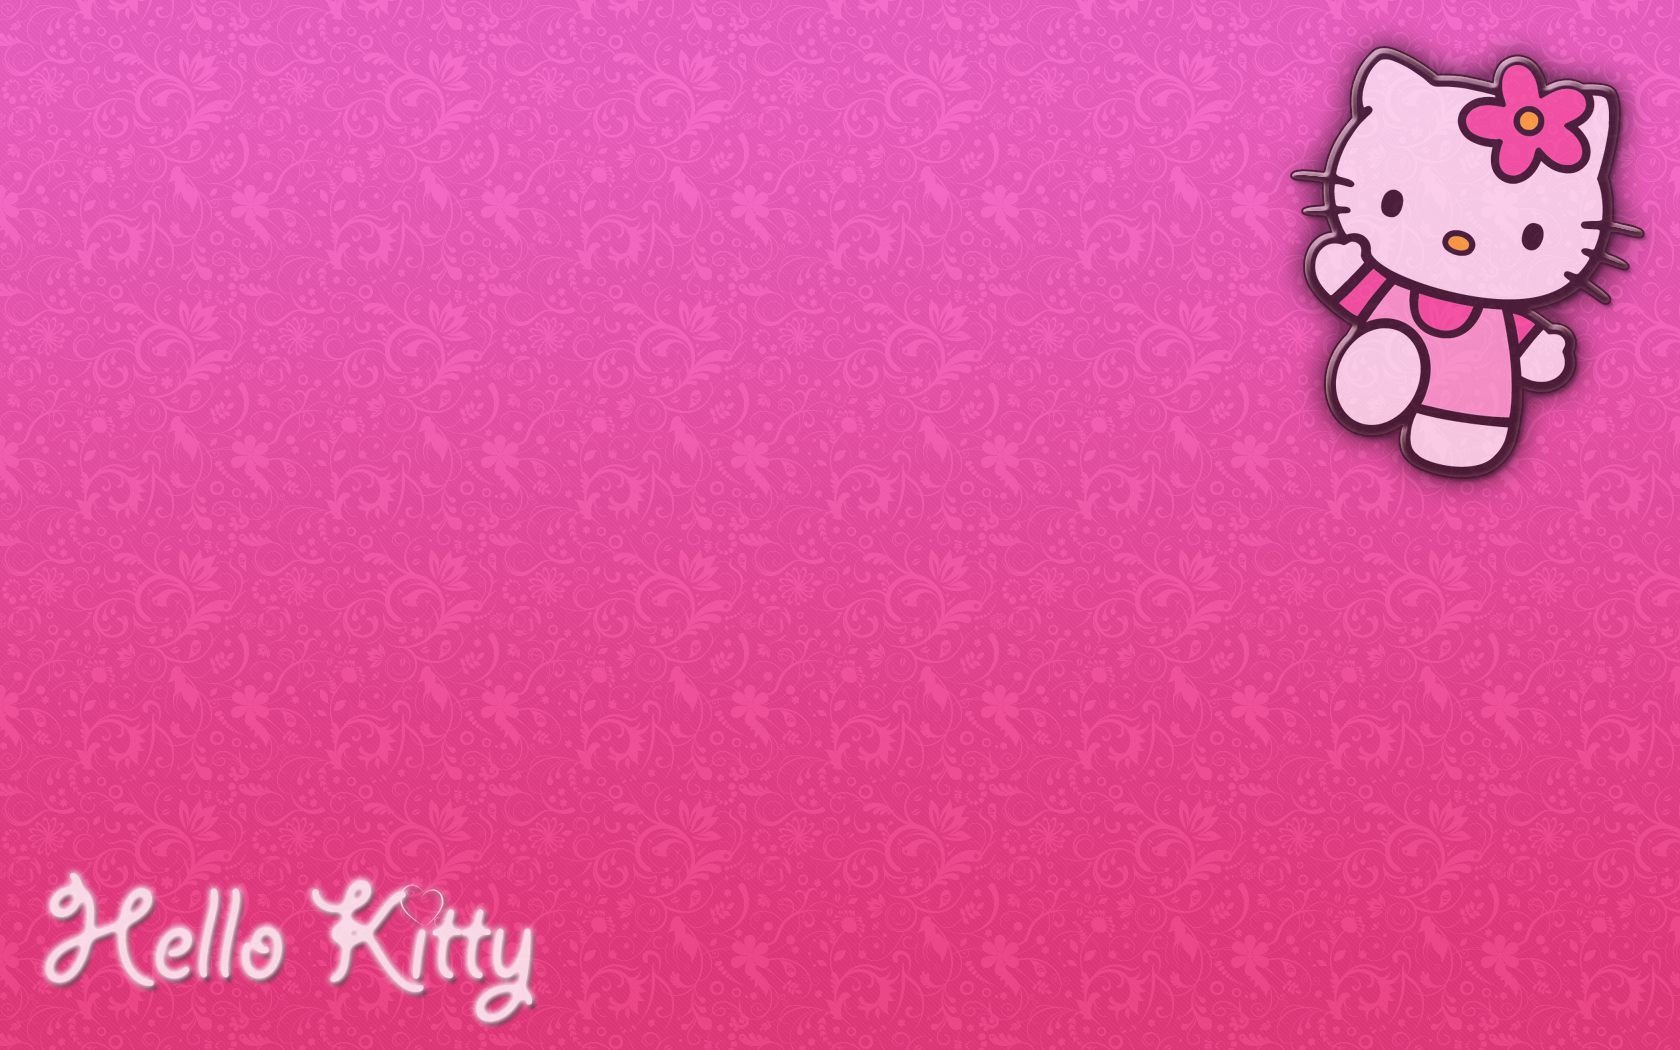 49 Cute Hello Kitty Wallpaper Desktop On Wallpapersafari